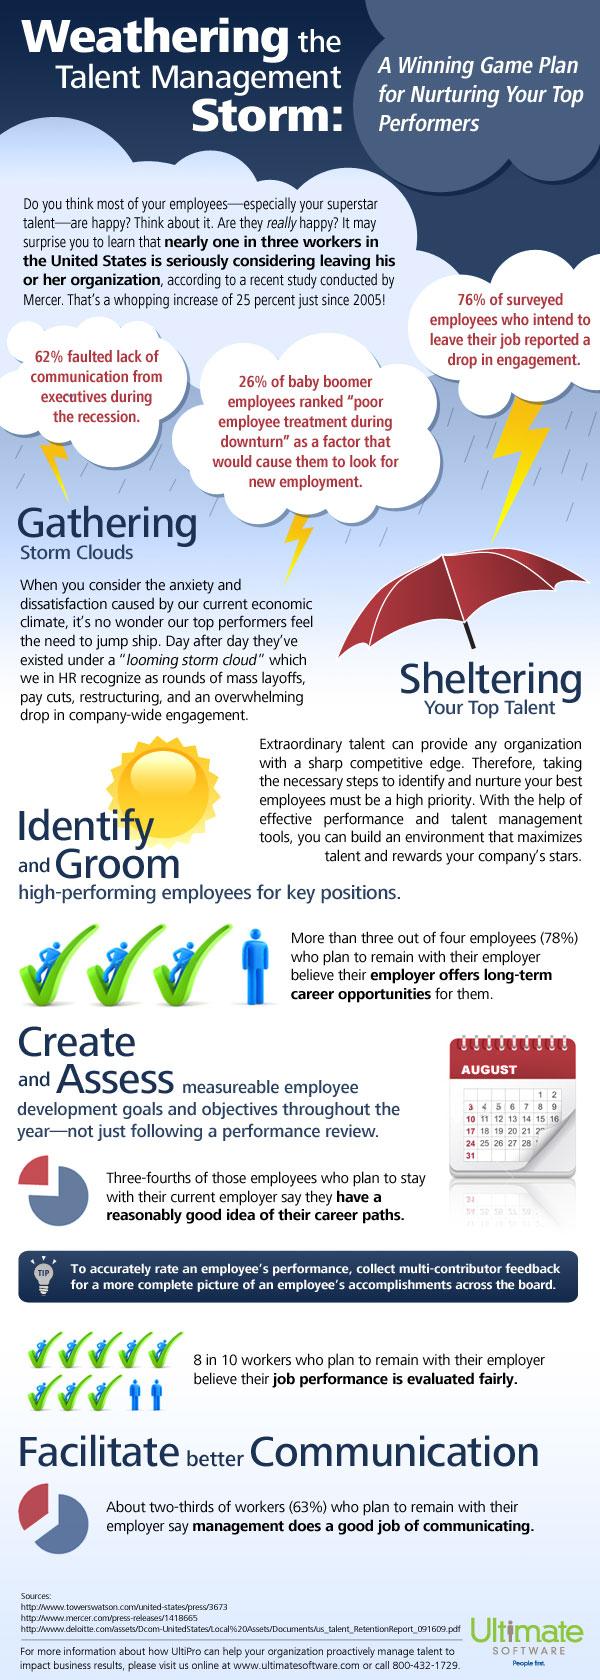 Weathering the Talent Management Storm